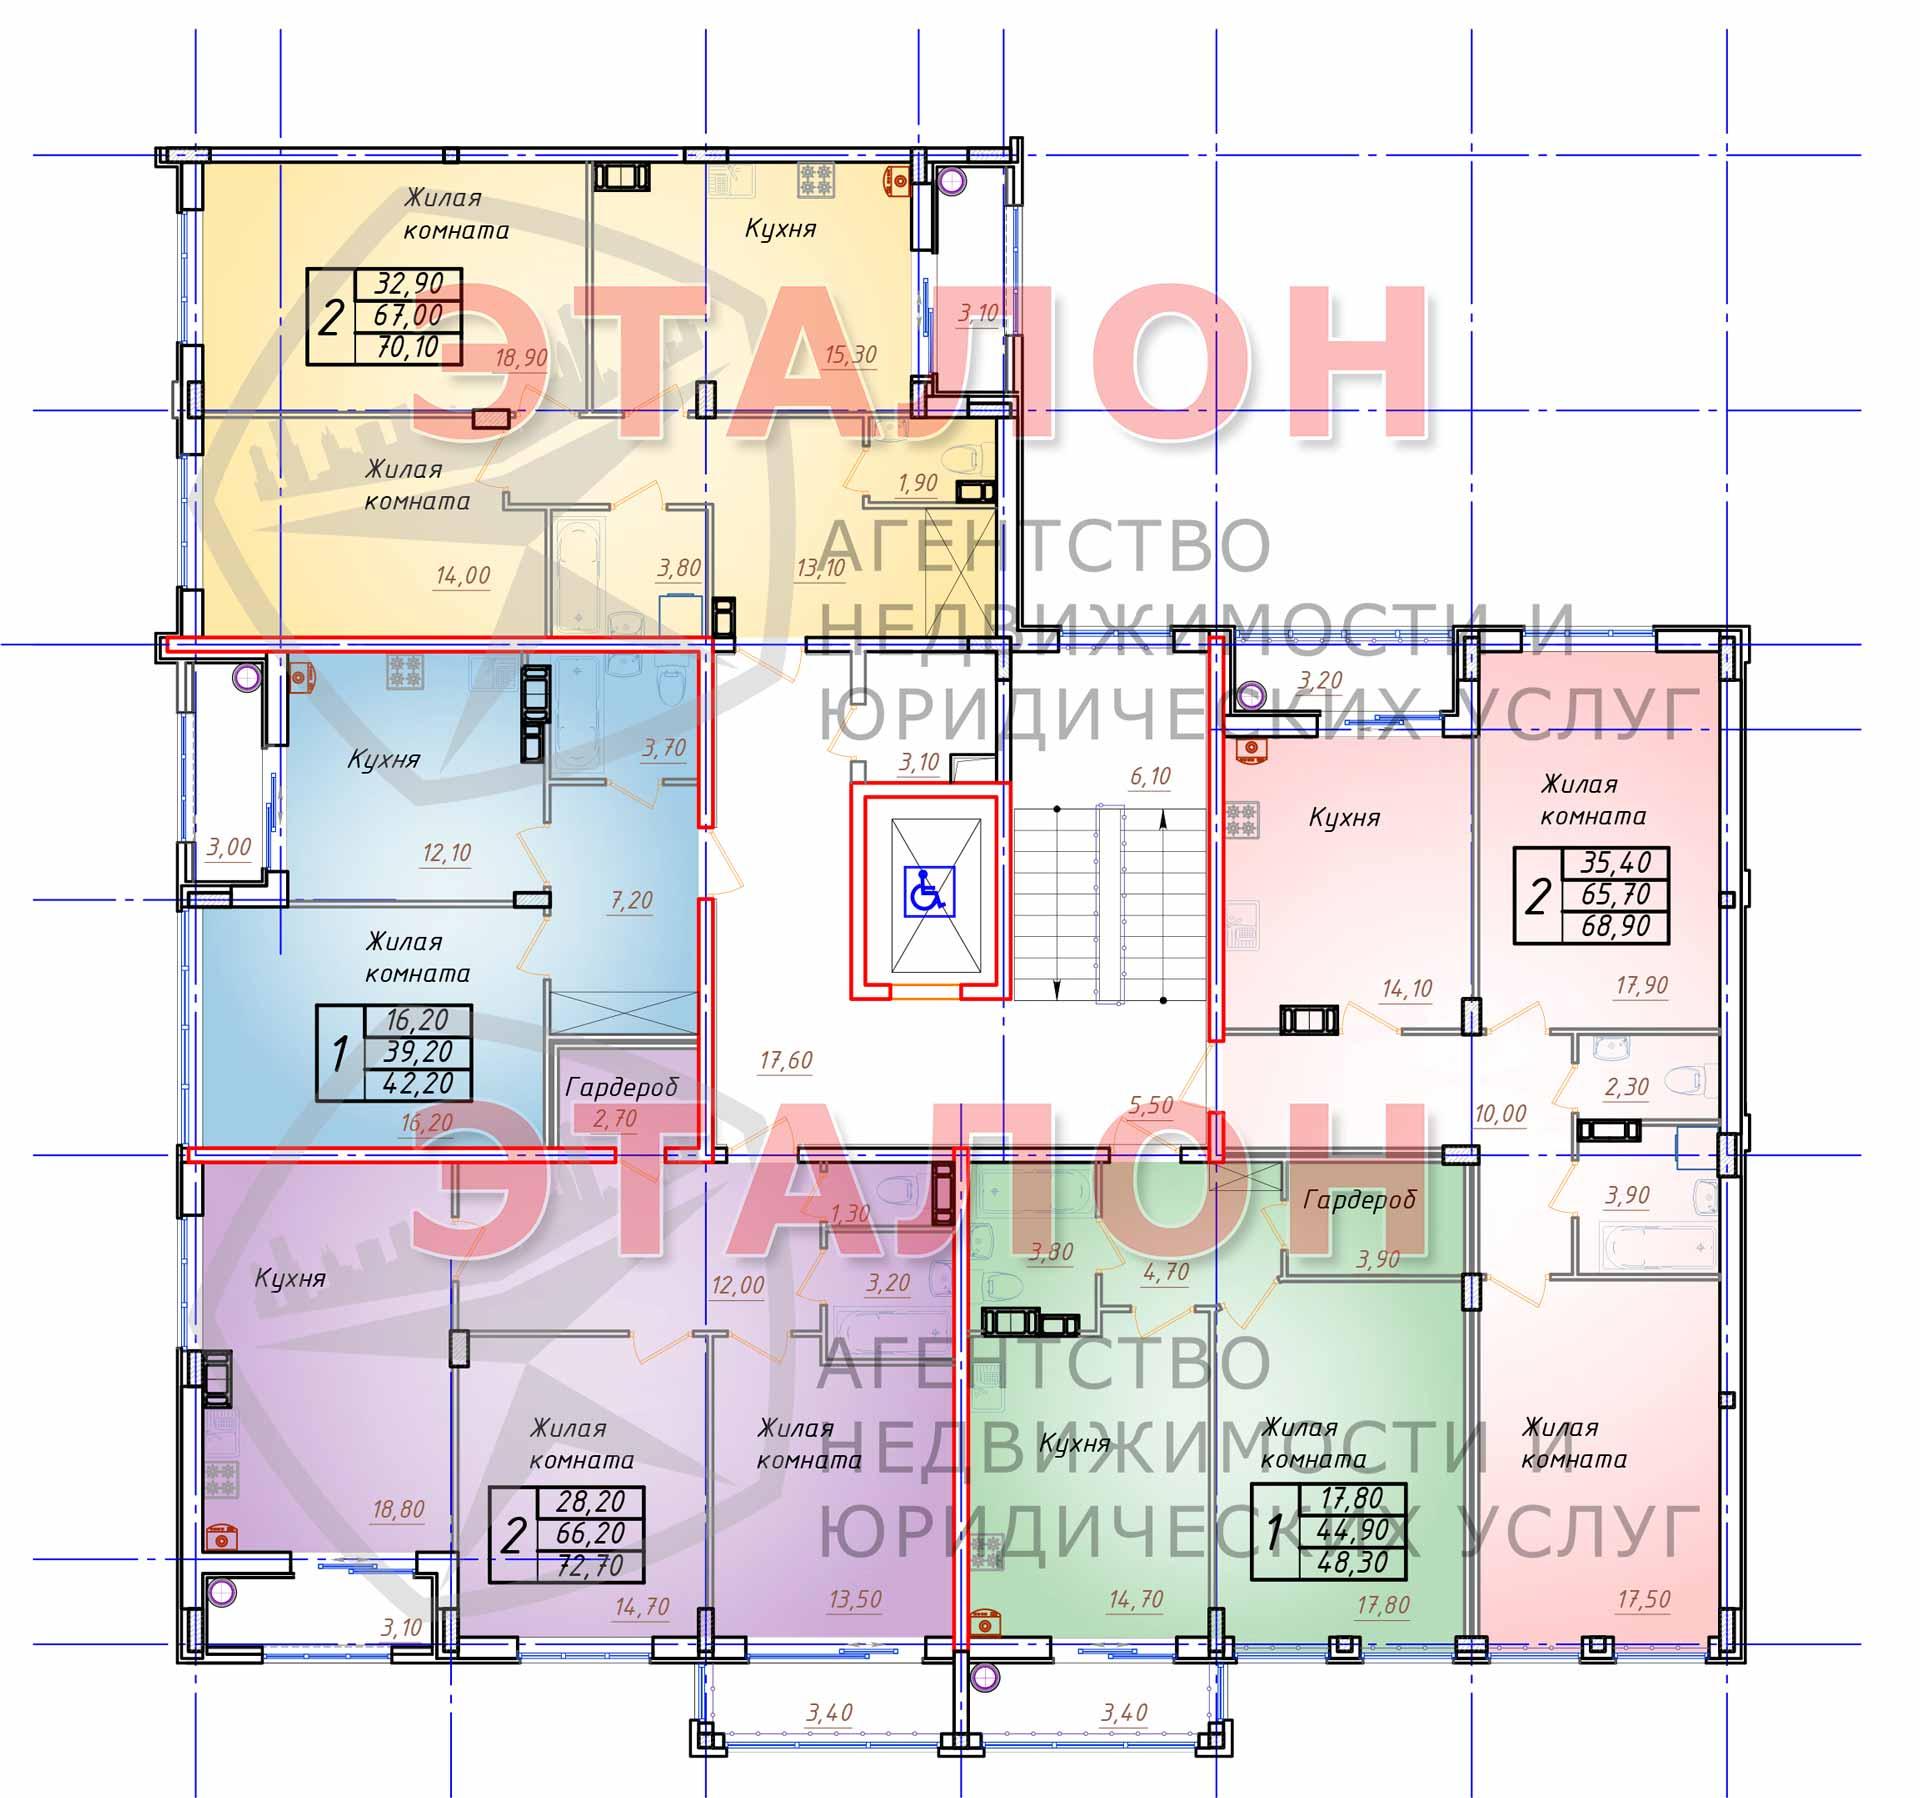 Блок 1. Подъезд 1. План 2-го этажа